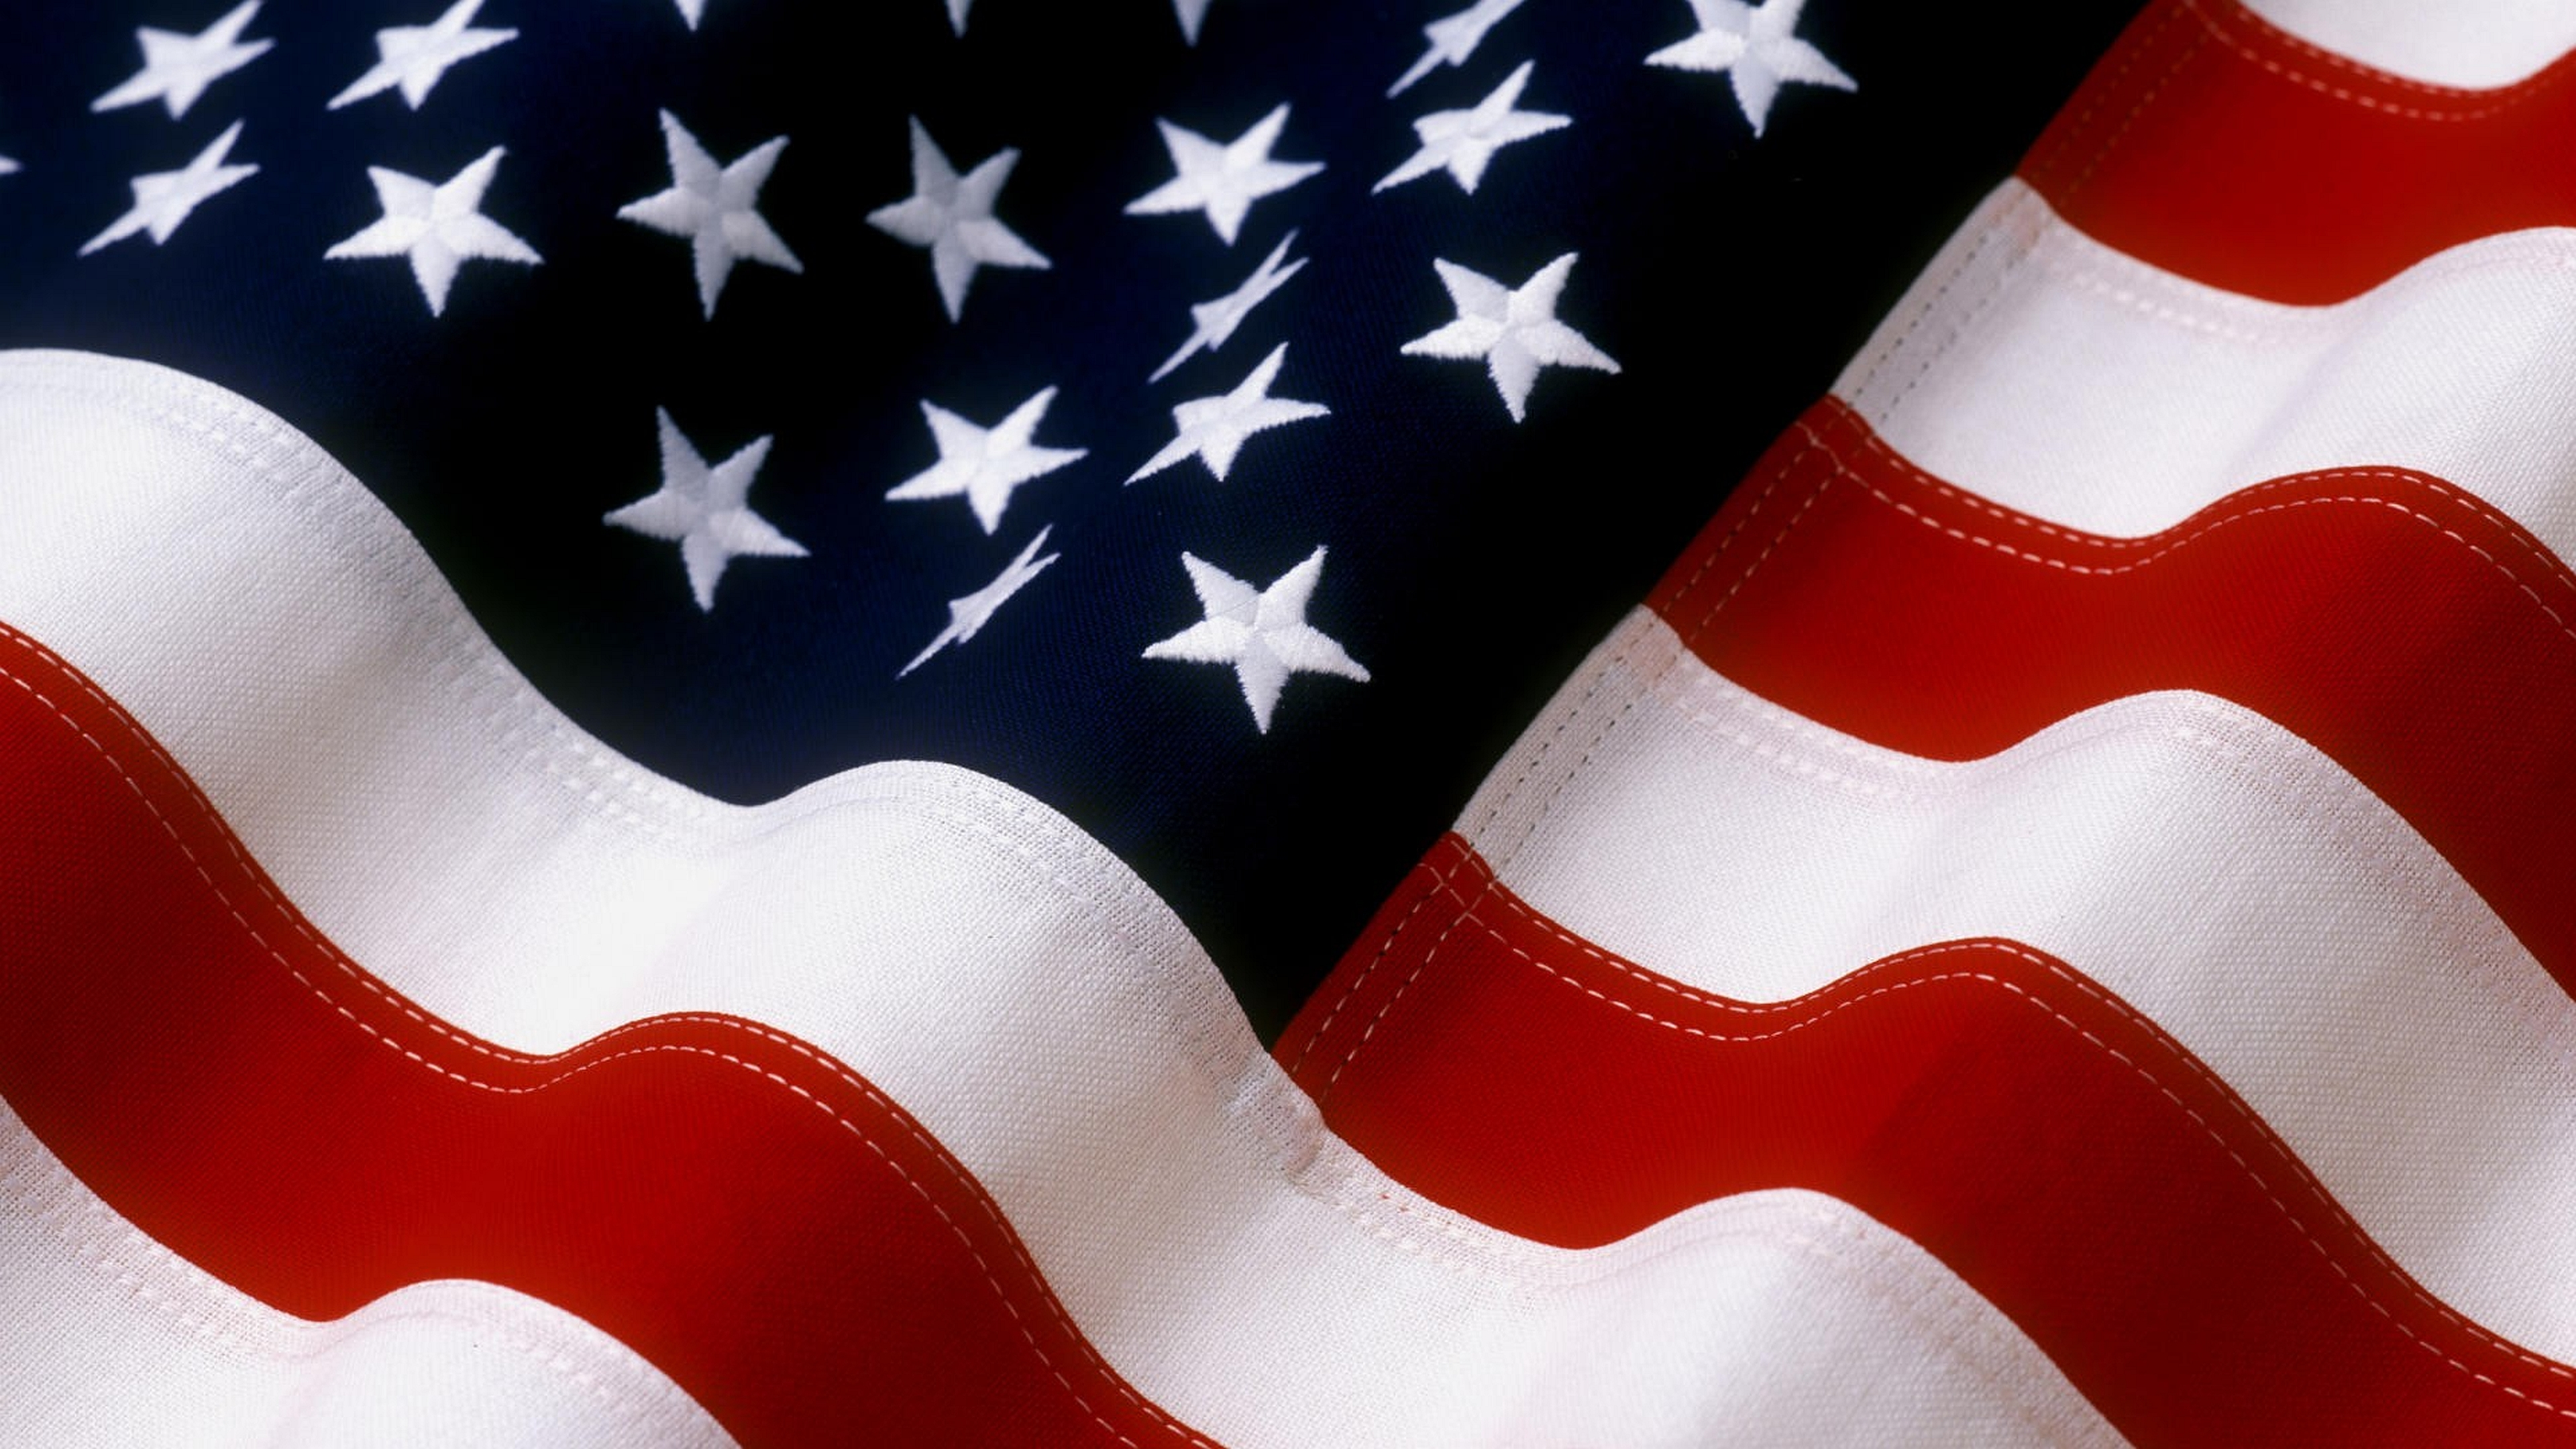 American Flag Background 3840x2160